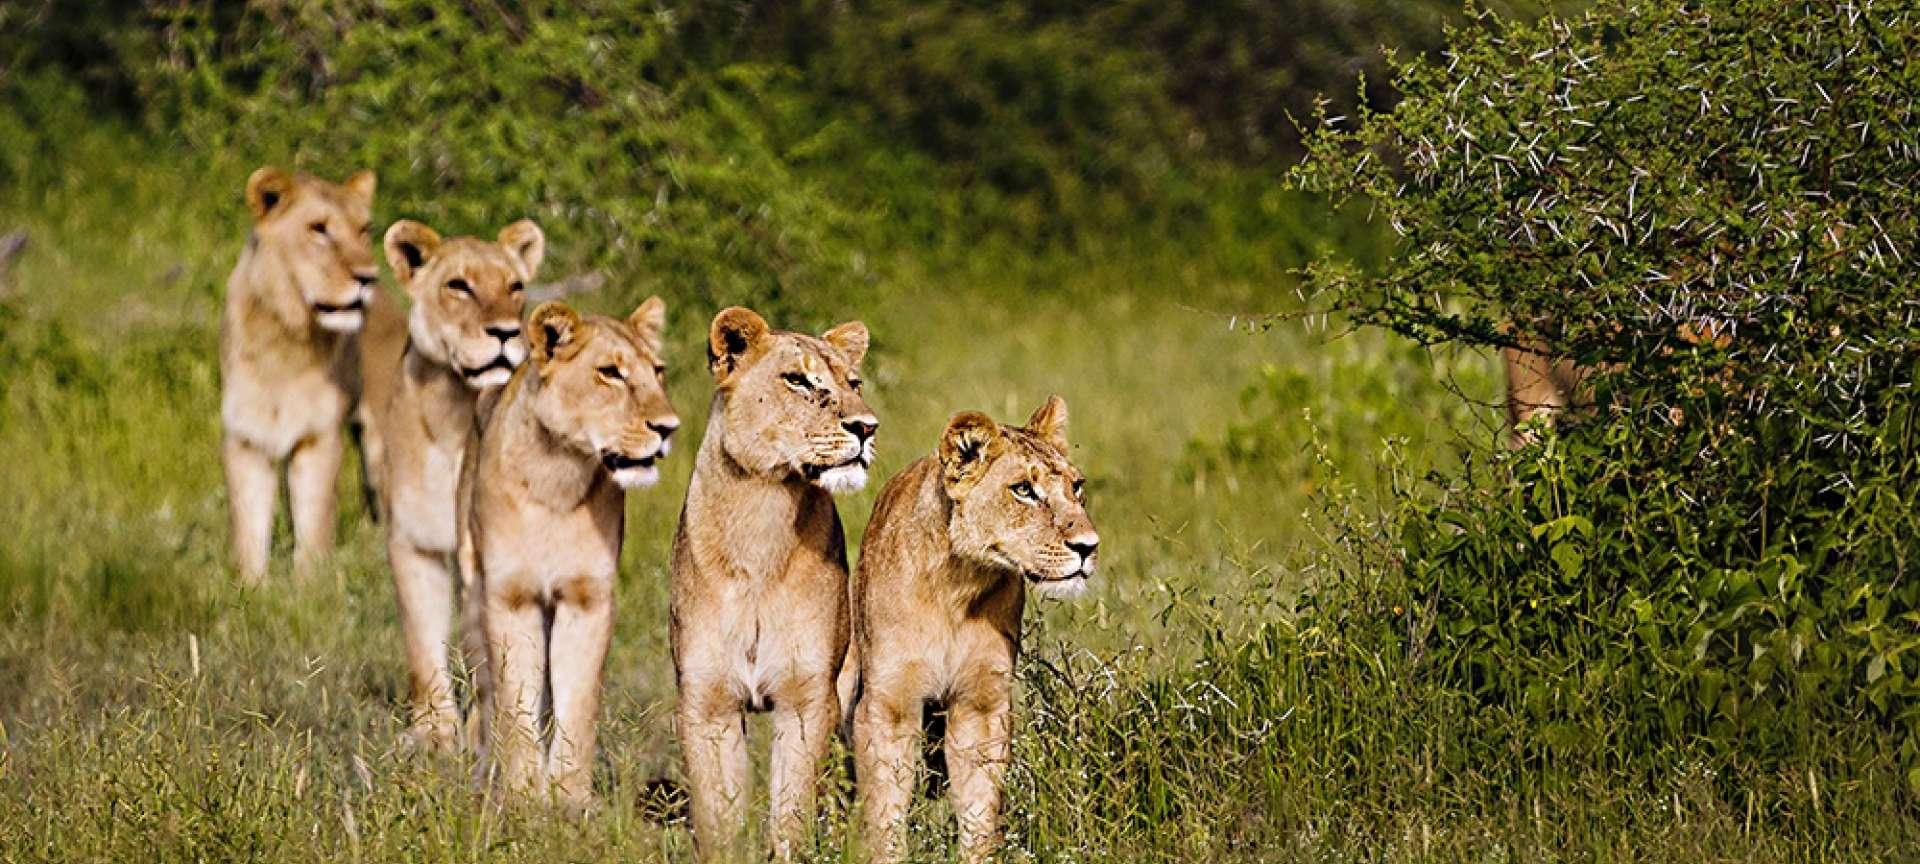 Chief's Island - Africa Wildlife Safaris